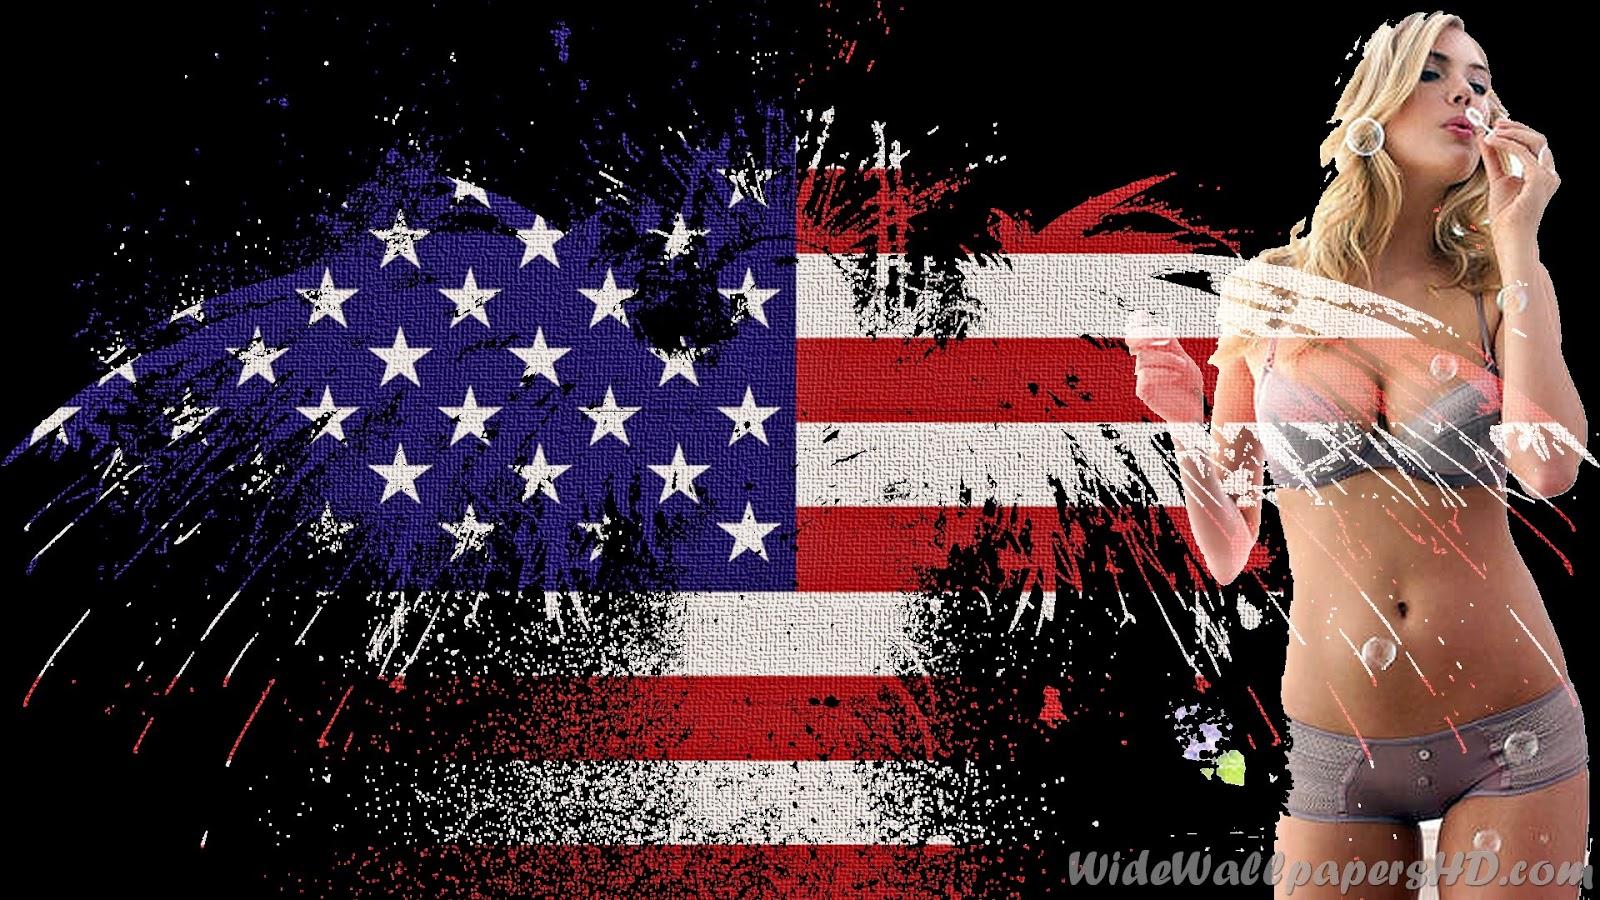 Veterans day wallpaper wallpapersafari - Animesh wallpaper ...